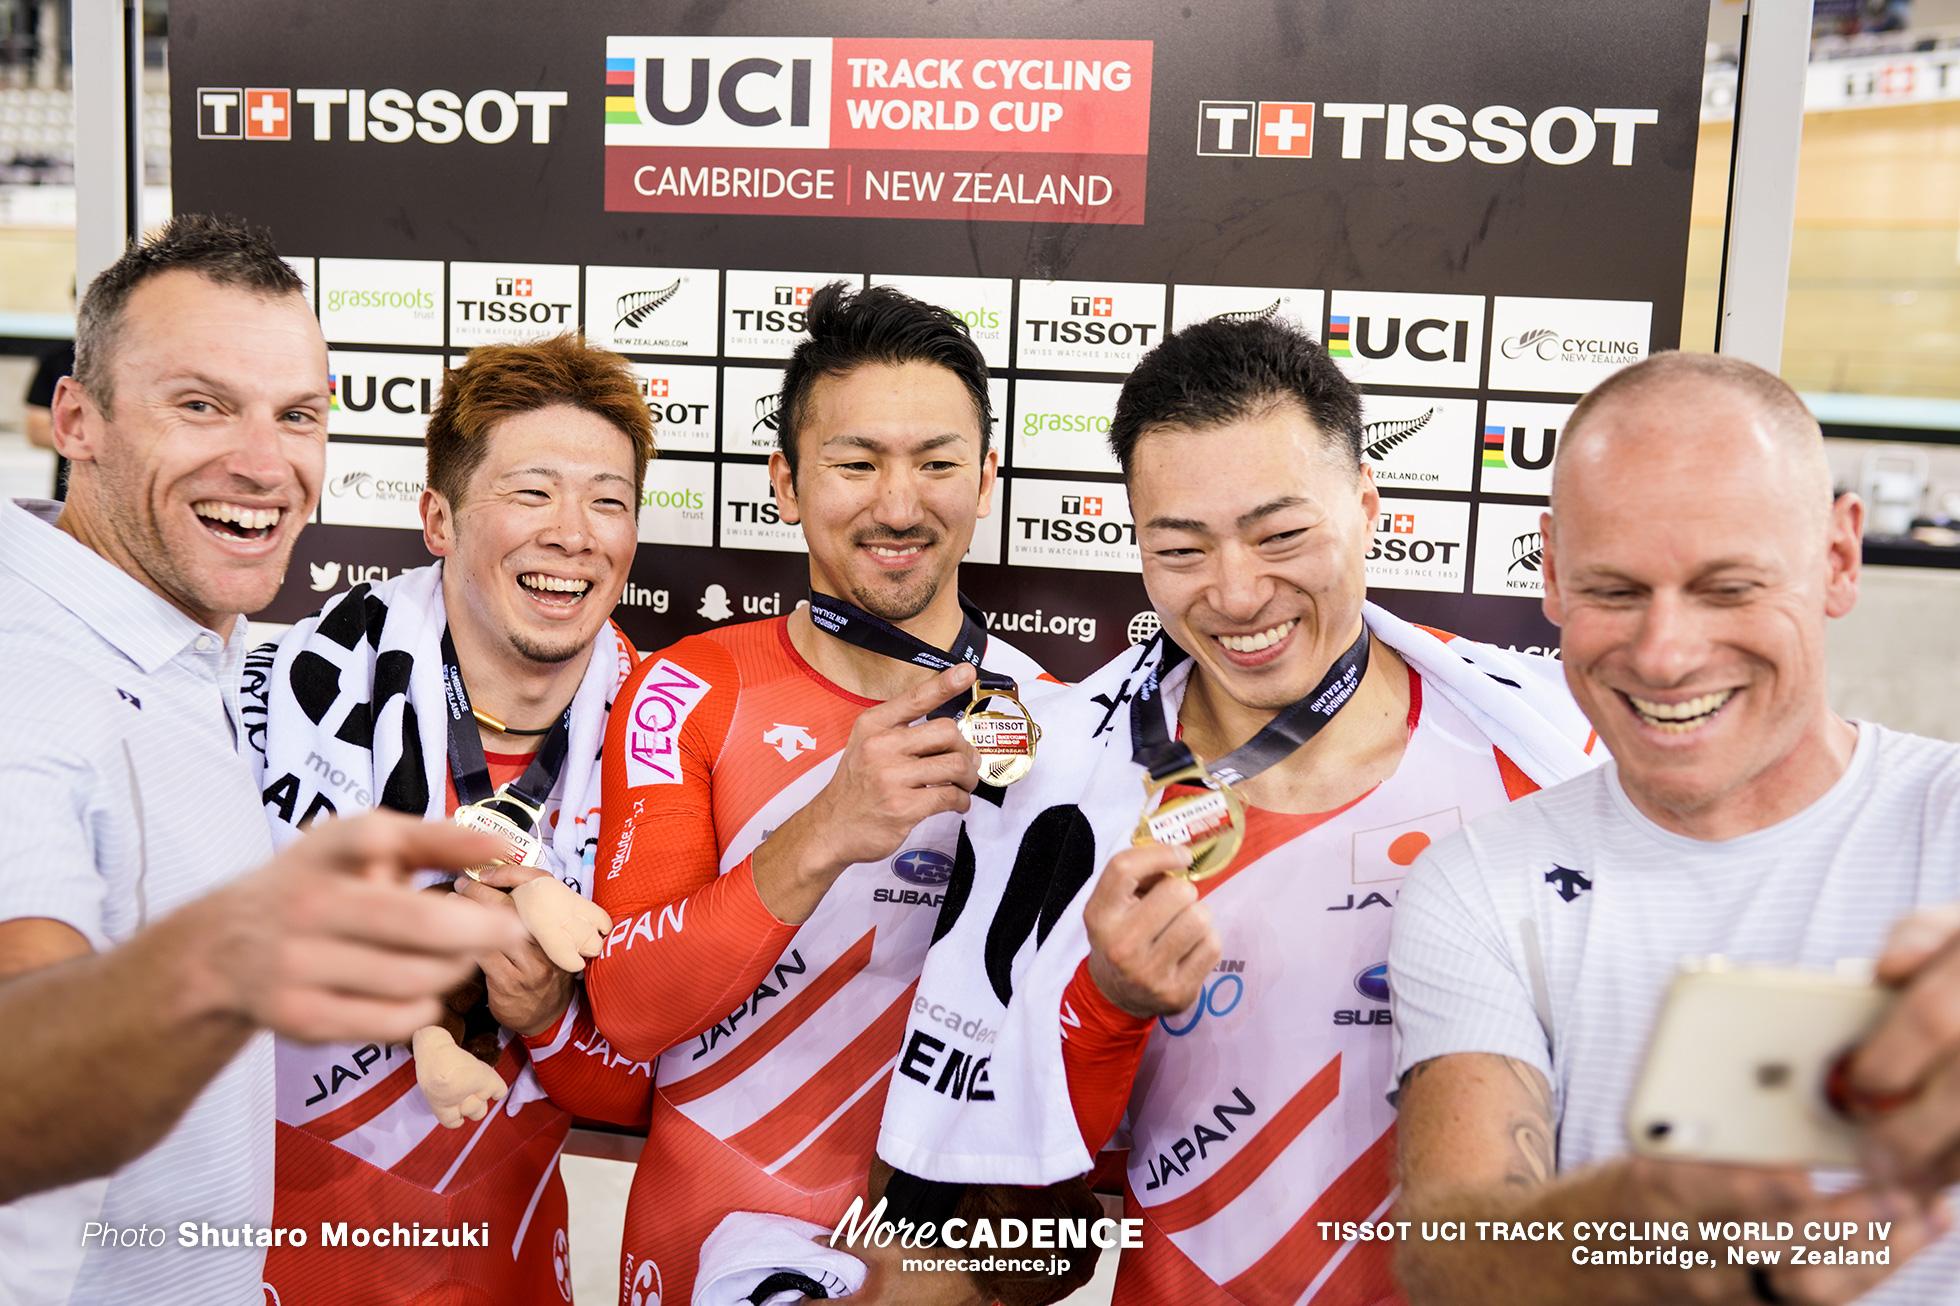 Final / Men's Team Sprint / TISSOT UCI TRACK CYCLING WORLD CUP IV, Cambridge, New Zealand, 深谷知広 新田祐大 雨谷一樹 ブノワ・ベトゥ ジェイソン・ニブレット